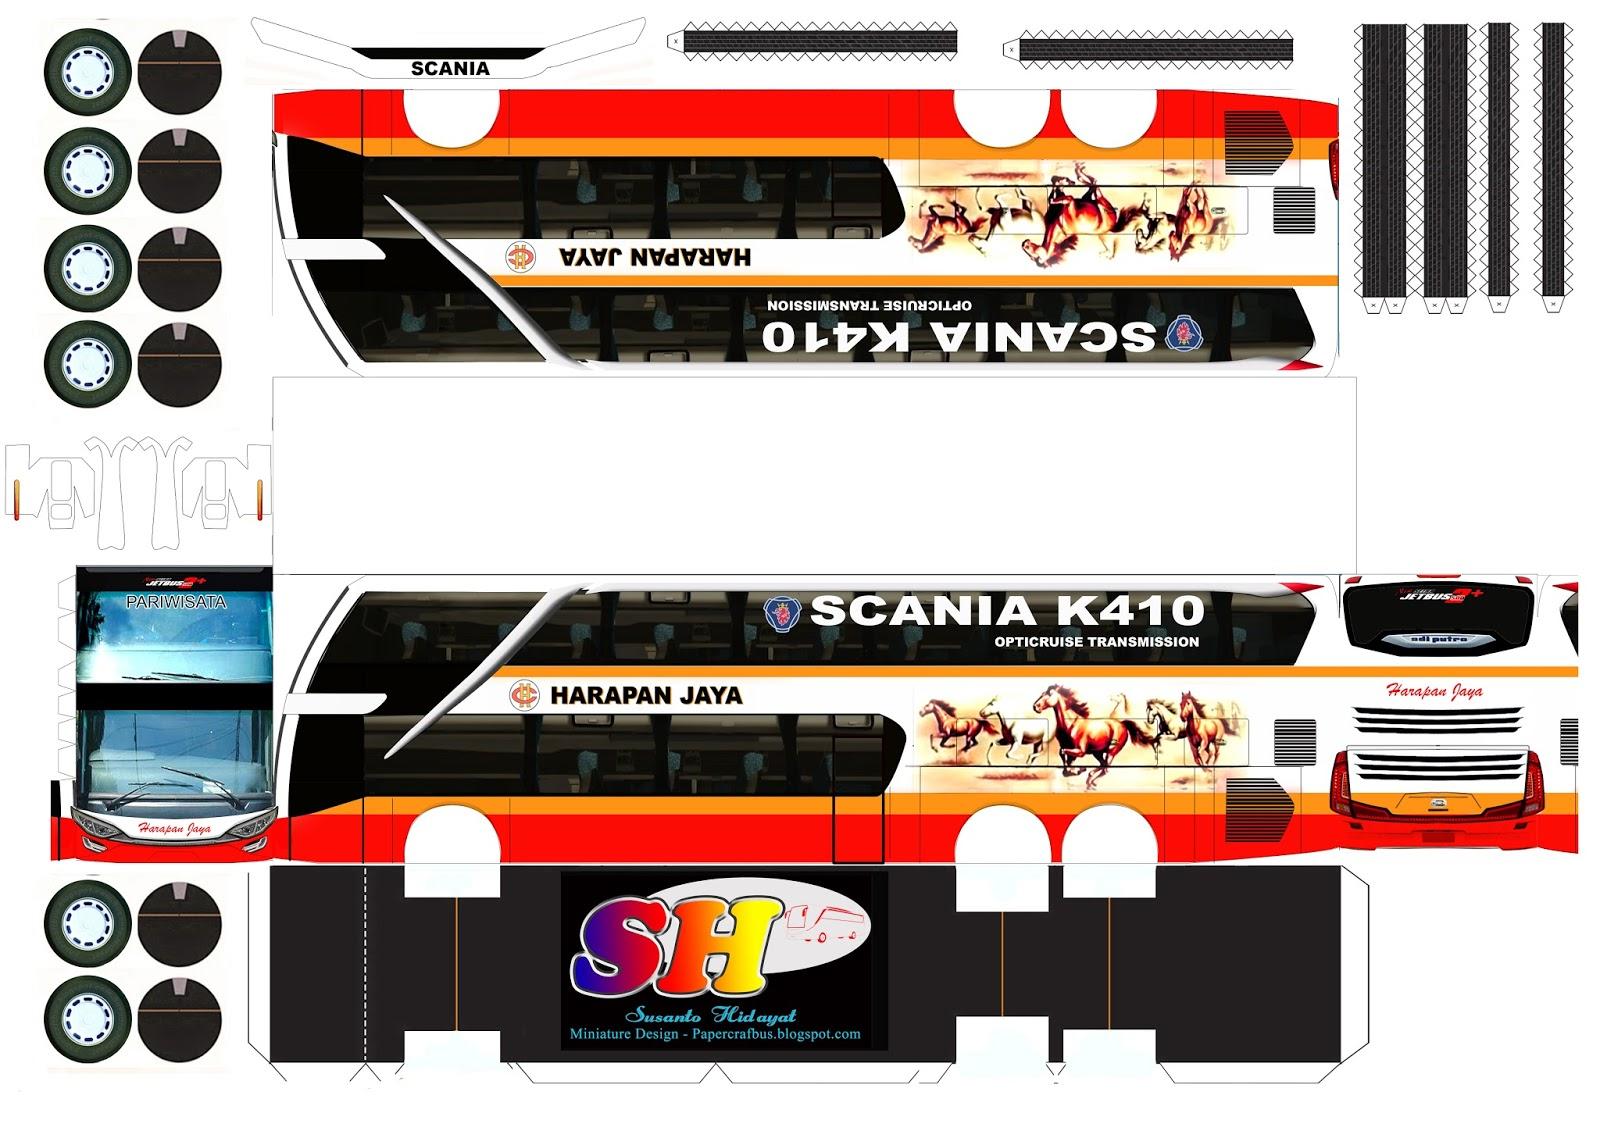 Pola Free Edisi Double Decker Design Papercraft Bus